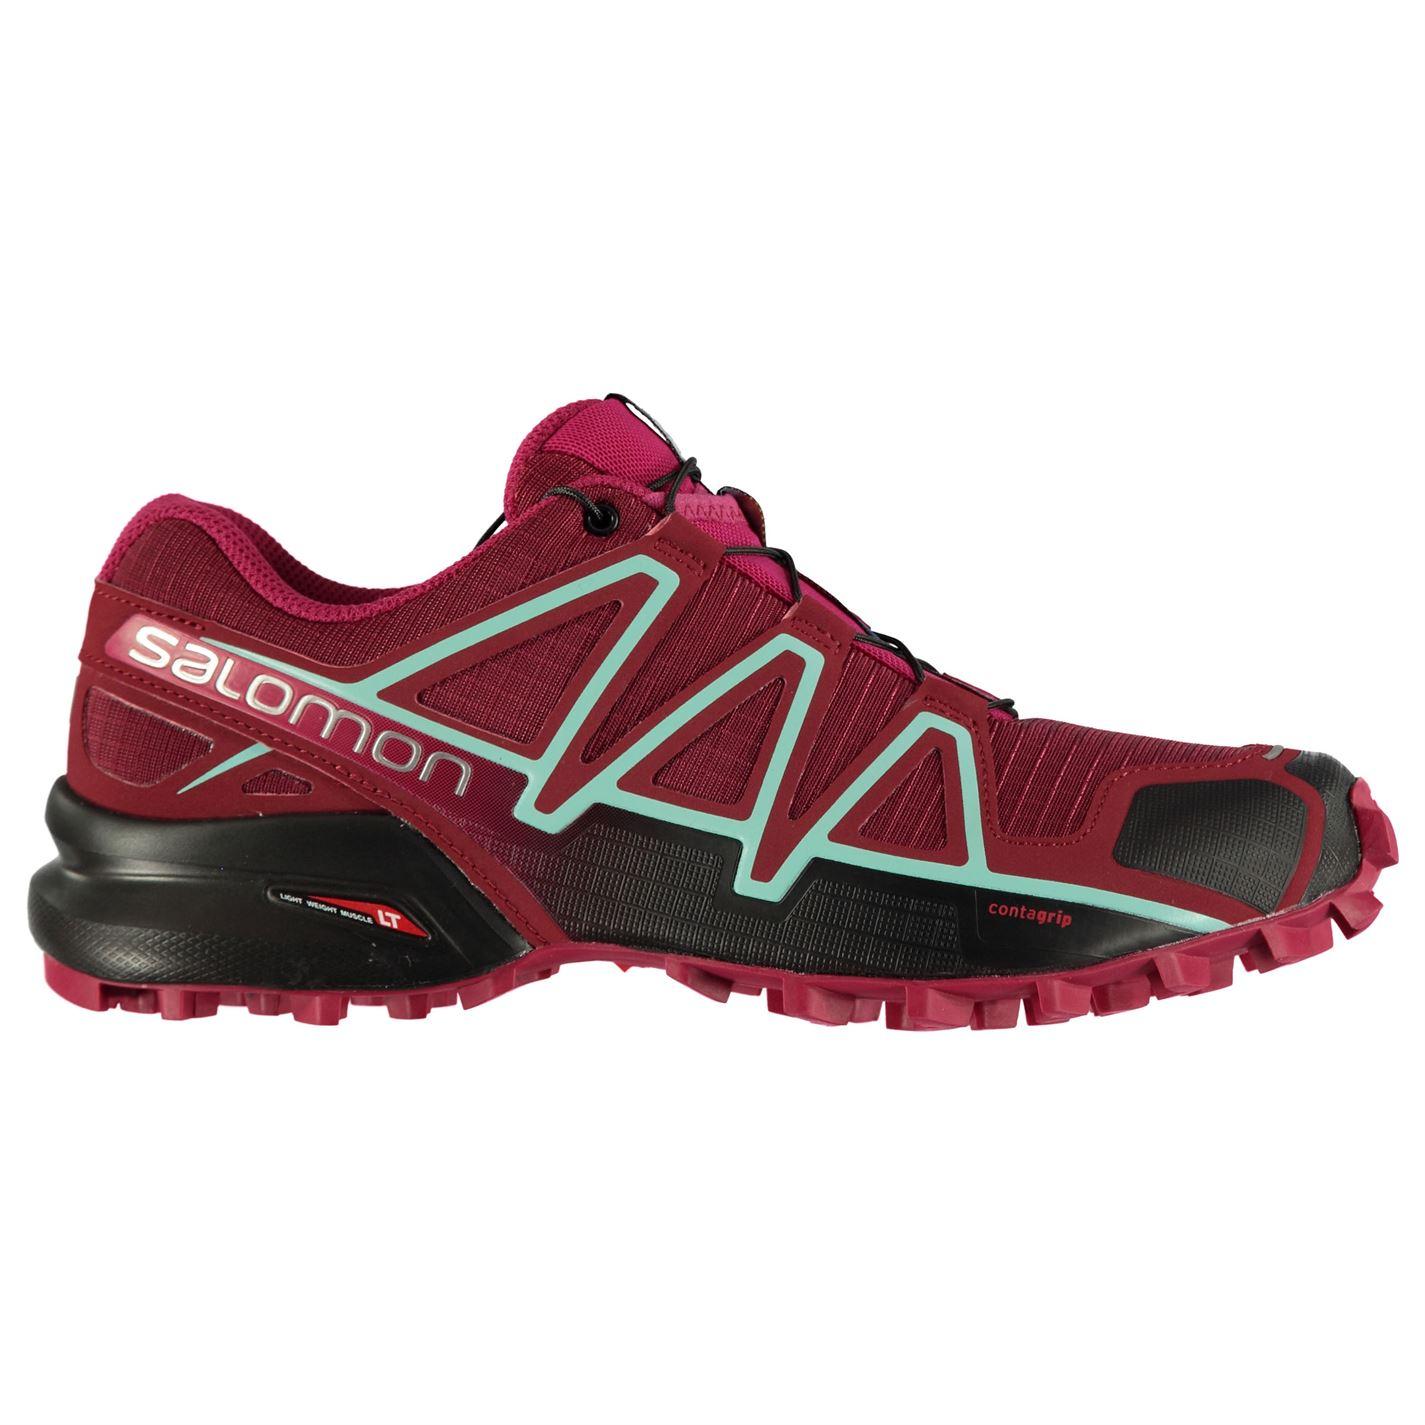 Salomon Speedcross 4 dámska bežecká obuv Red Pink Blk - Glami.sk f567a4688d3